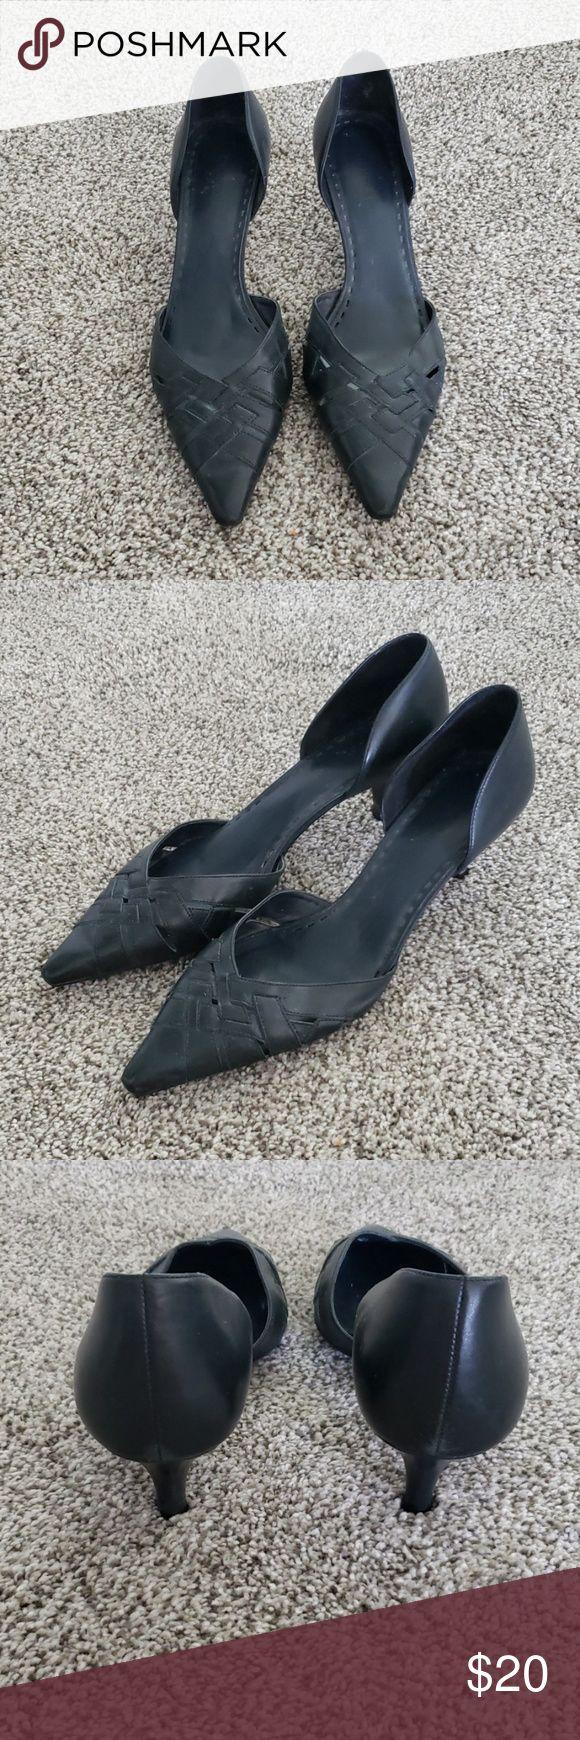 Black Heels Like new Pointed Toe Black Heels by Gianni Bini. 2″ Heel, easy to wa…